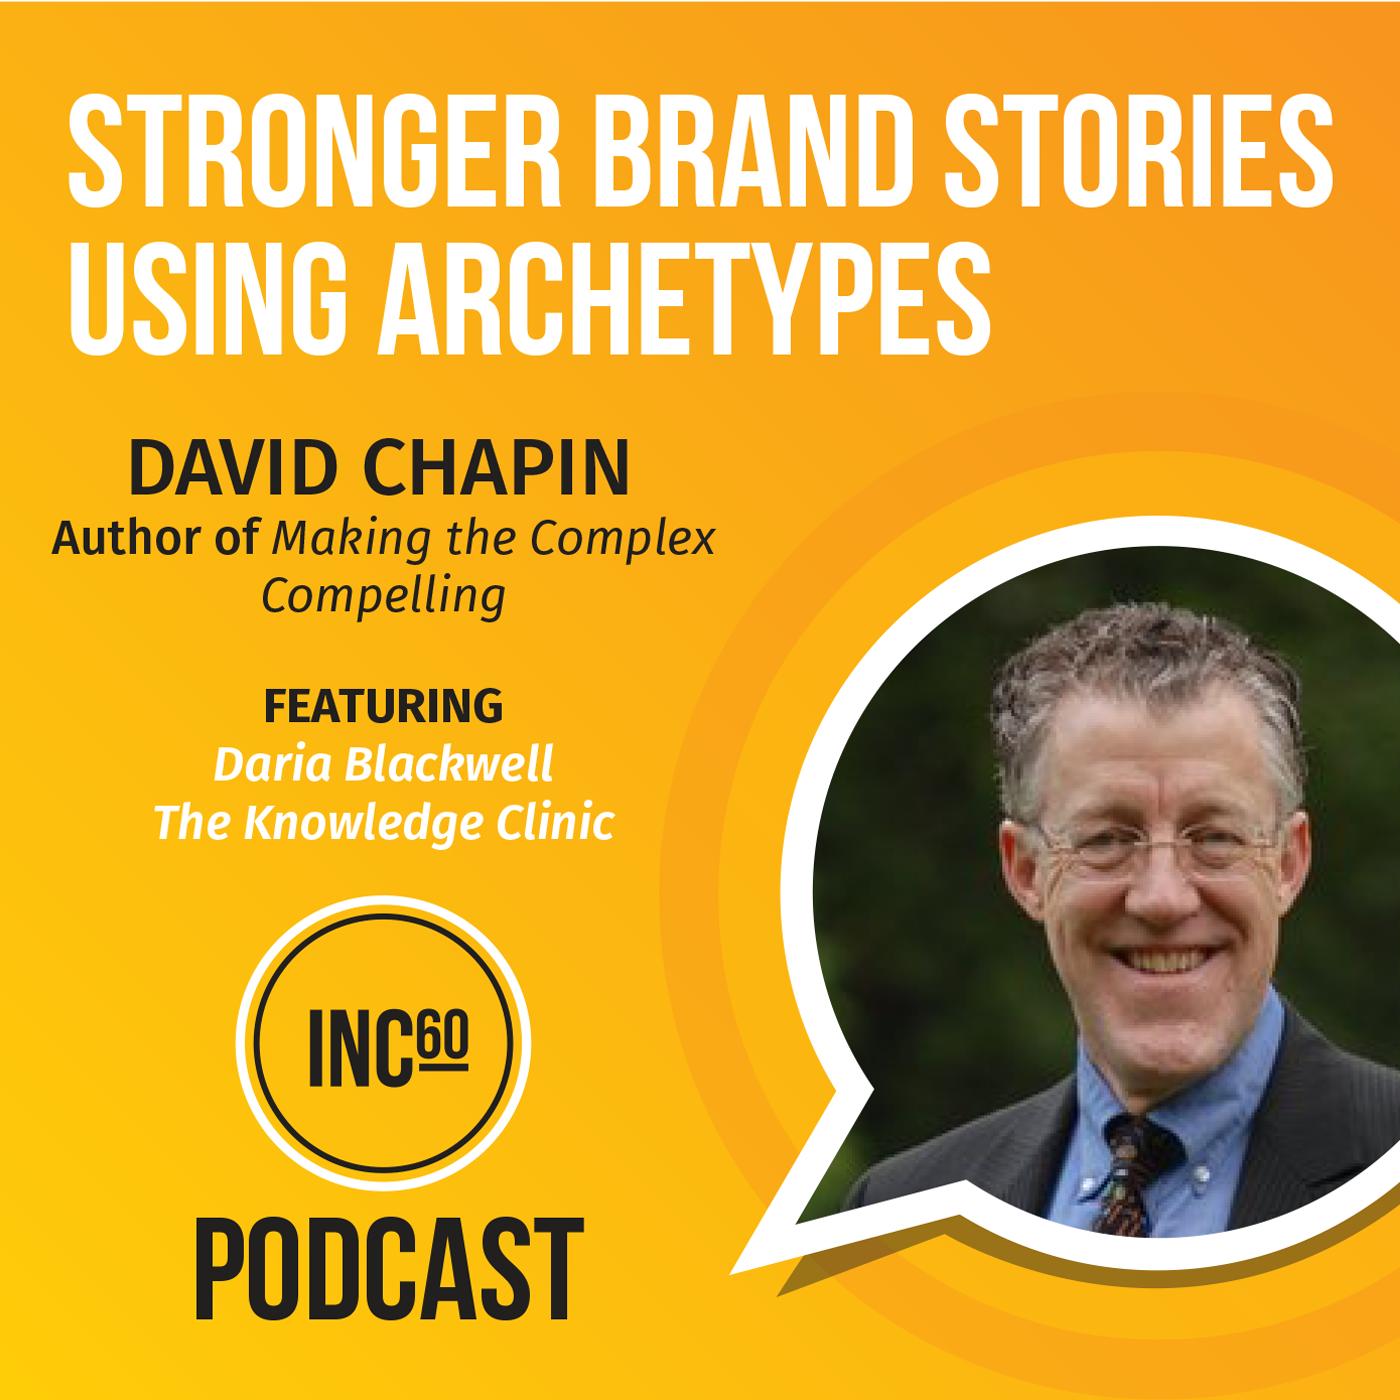 Business Podcast on Branding